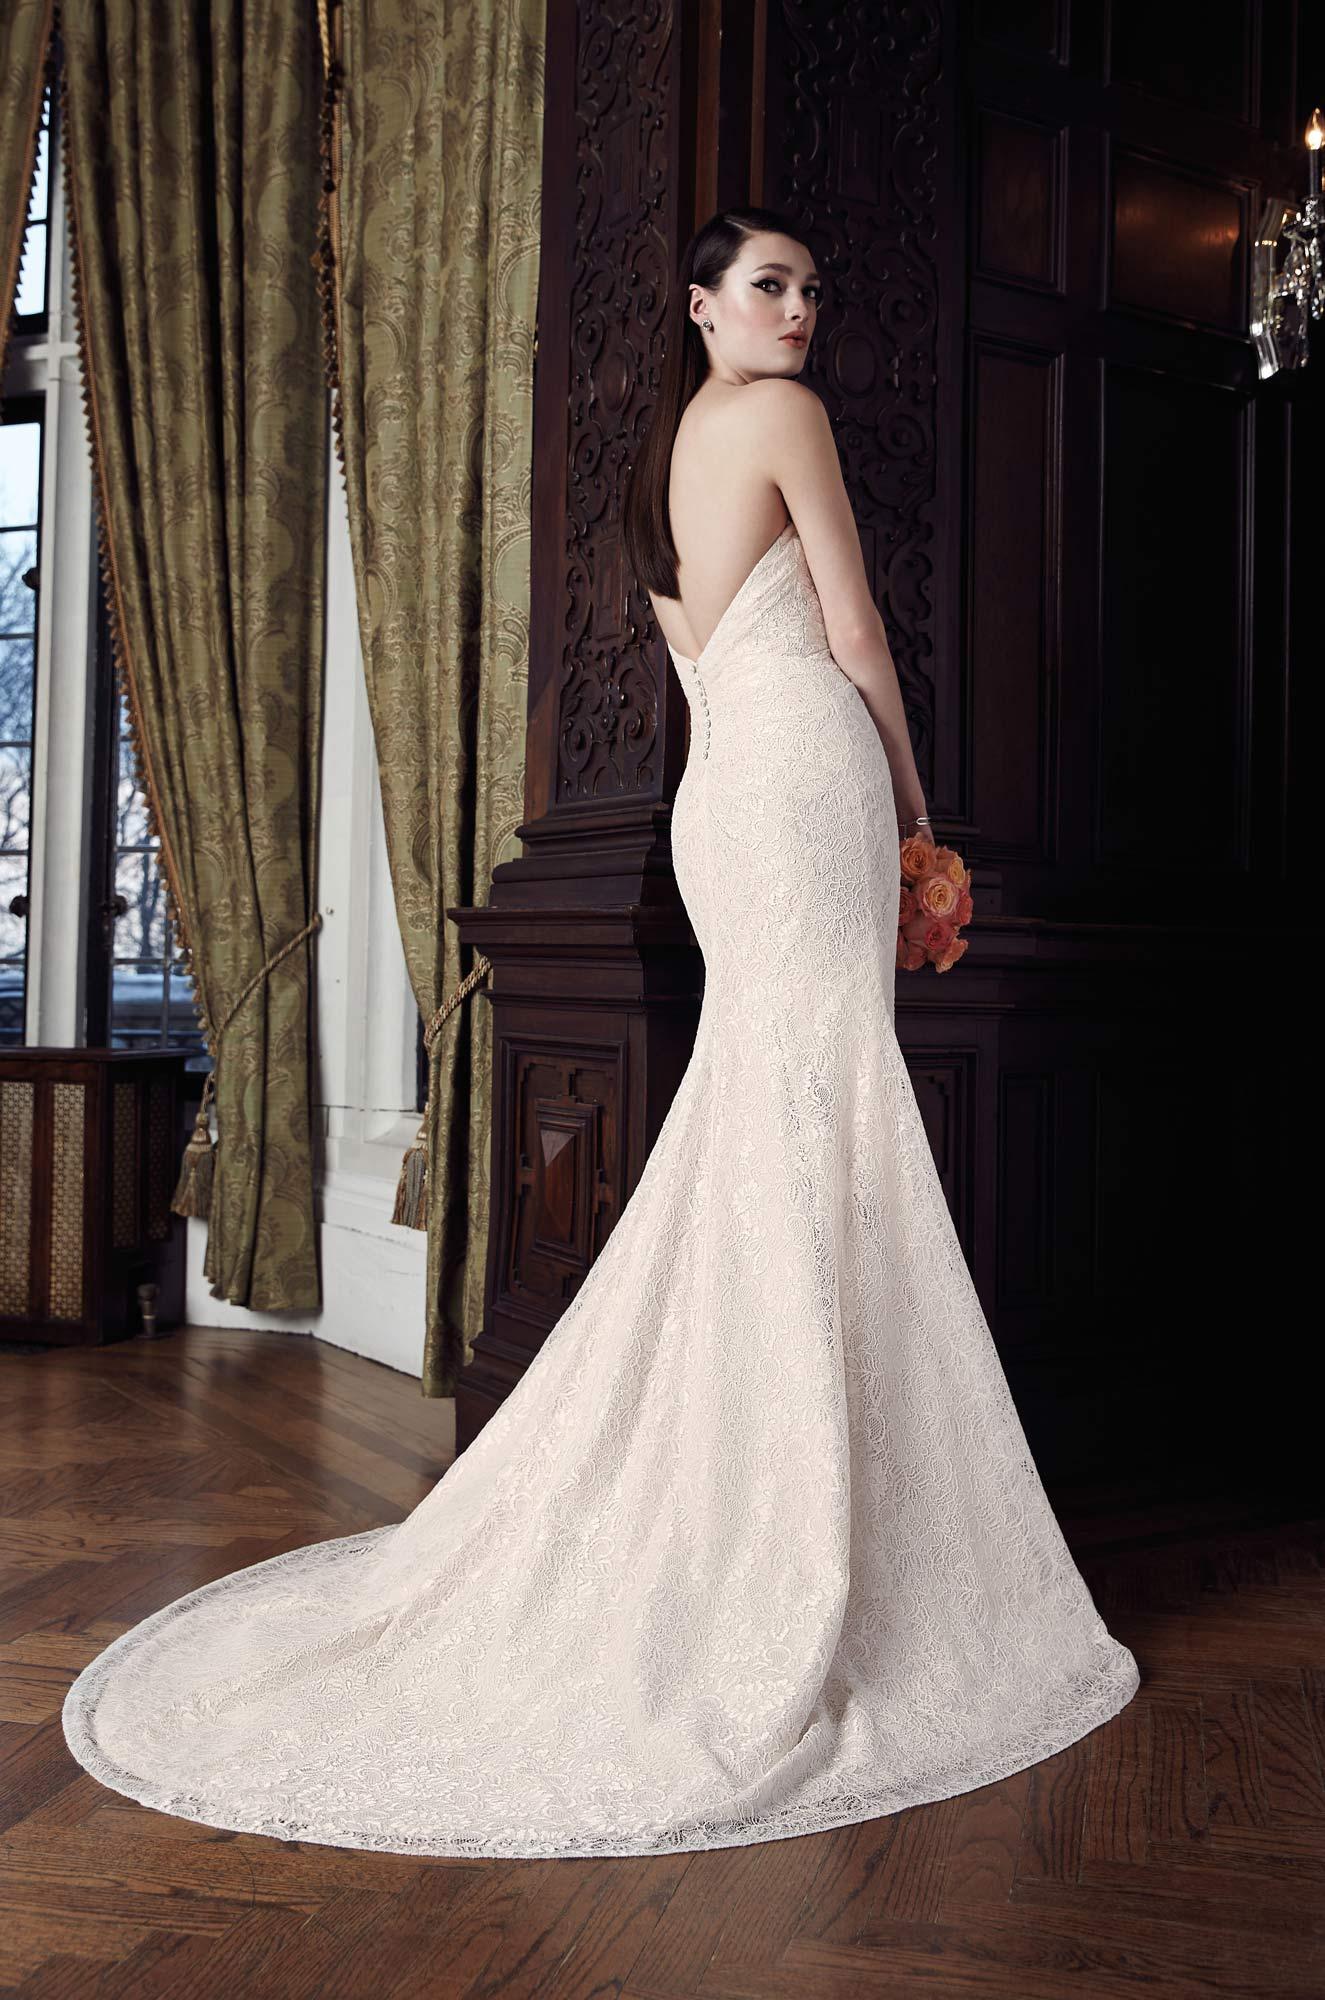 Ruched Lace Wedding Dress Style 2017 Mikaella Bridal